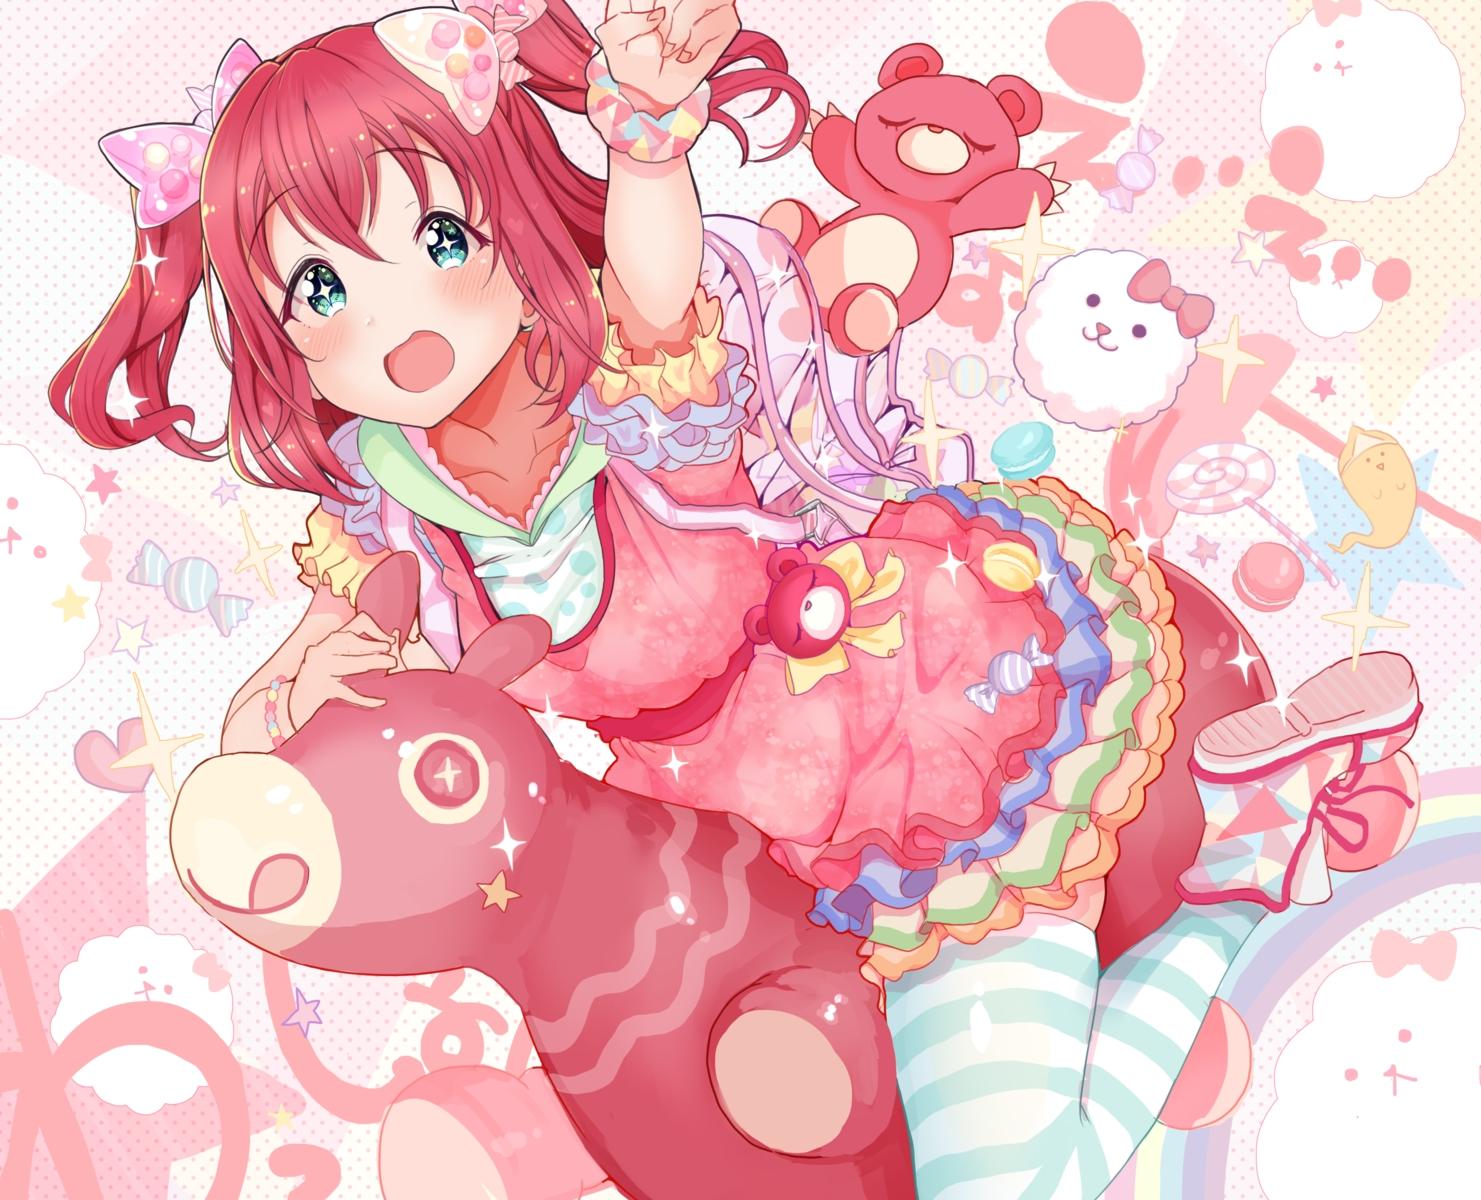 aqua_eyes blush bow hoodie kurosawa_ruby kuzu_kow love_live!_school_idol_project love_live!_sunshine!! red_hair short_hair teddy_bear thighhighs twintails wristwear